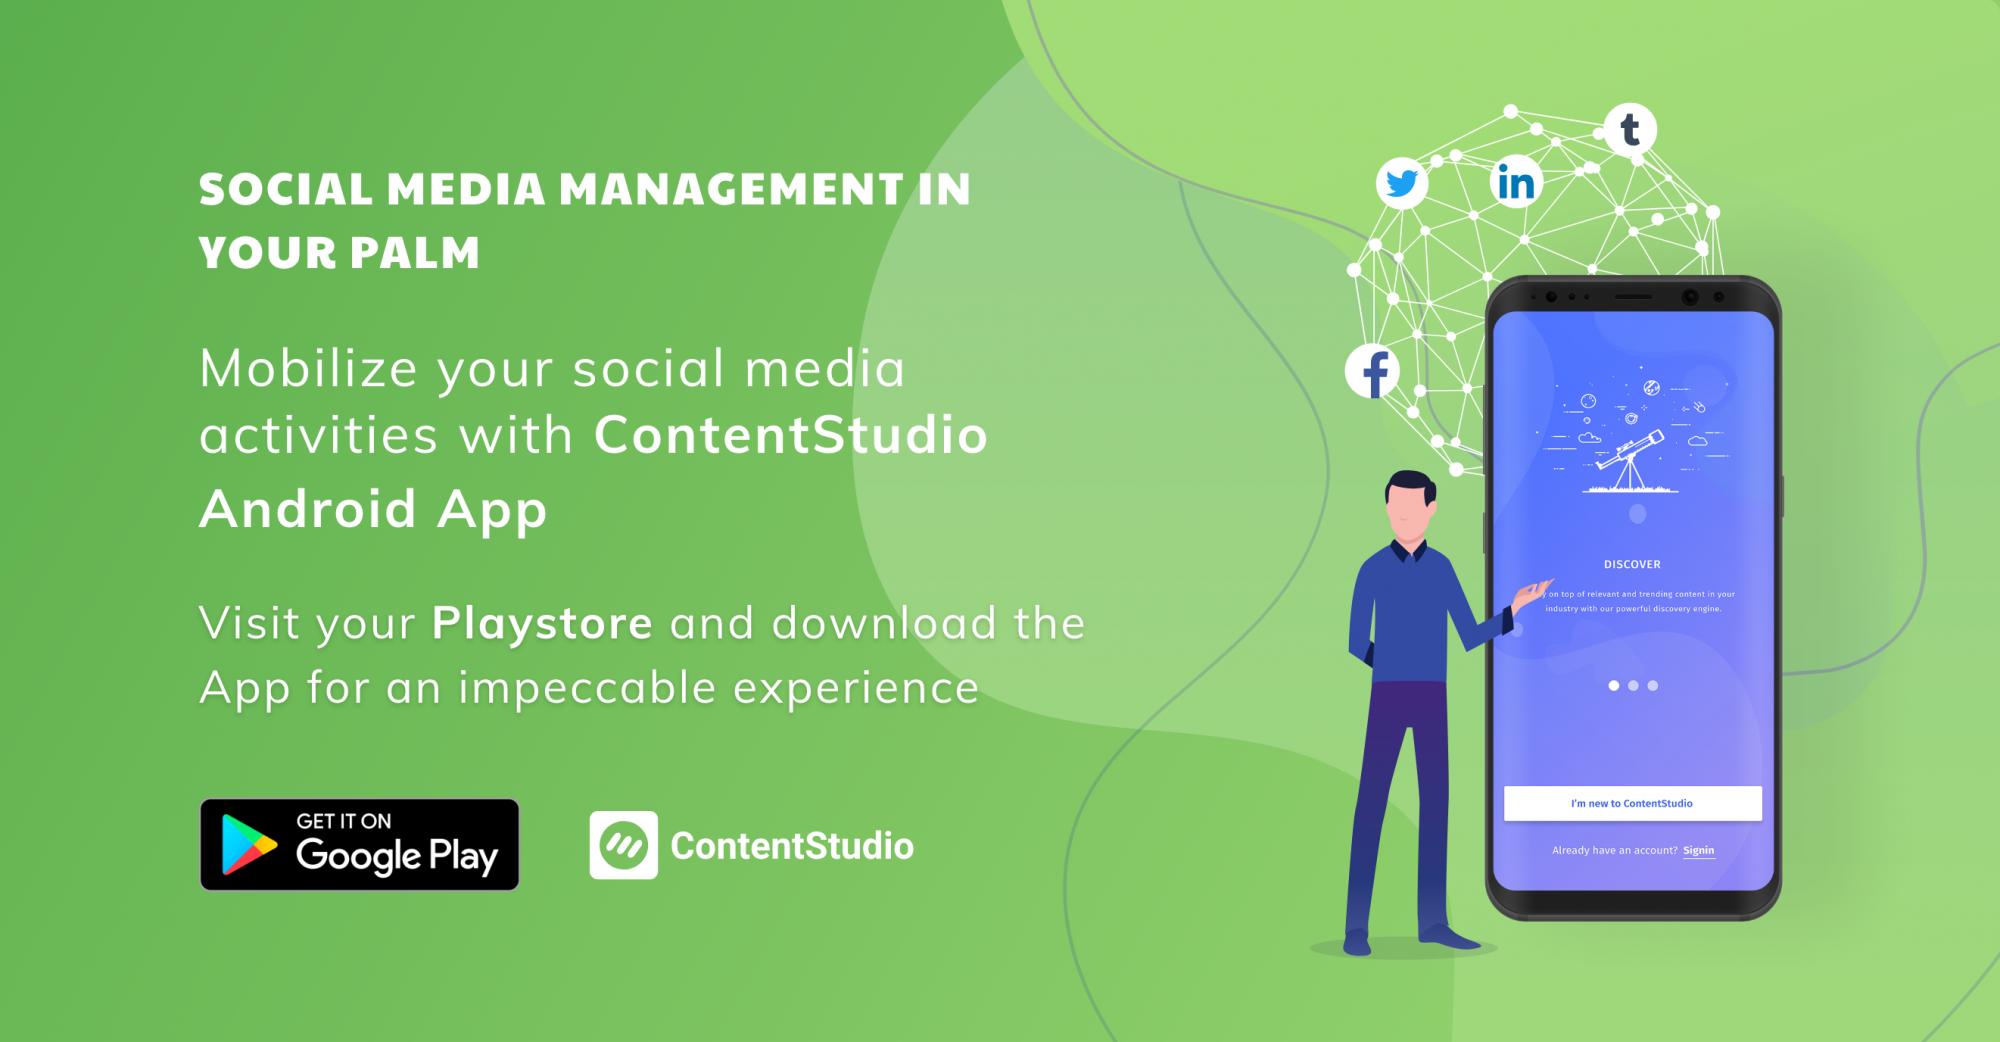 ContentStudio Android App